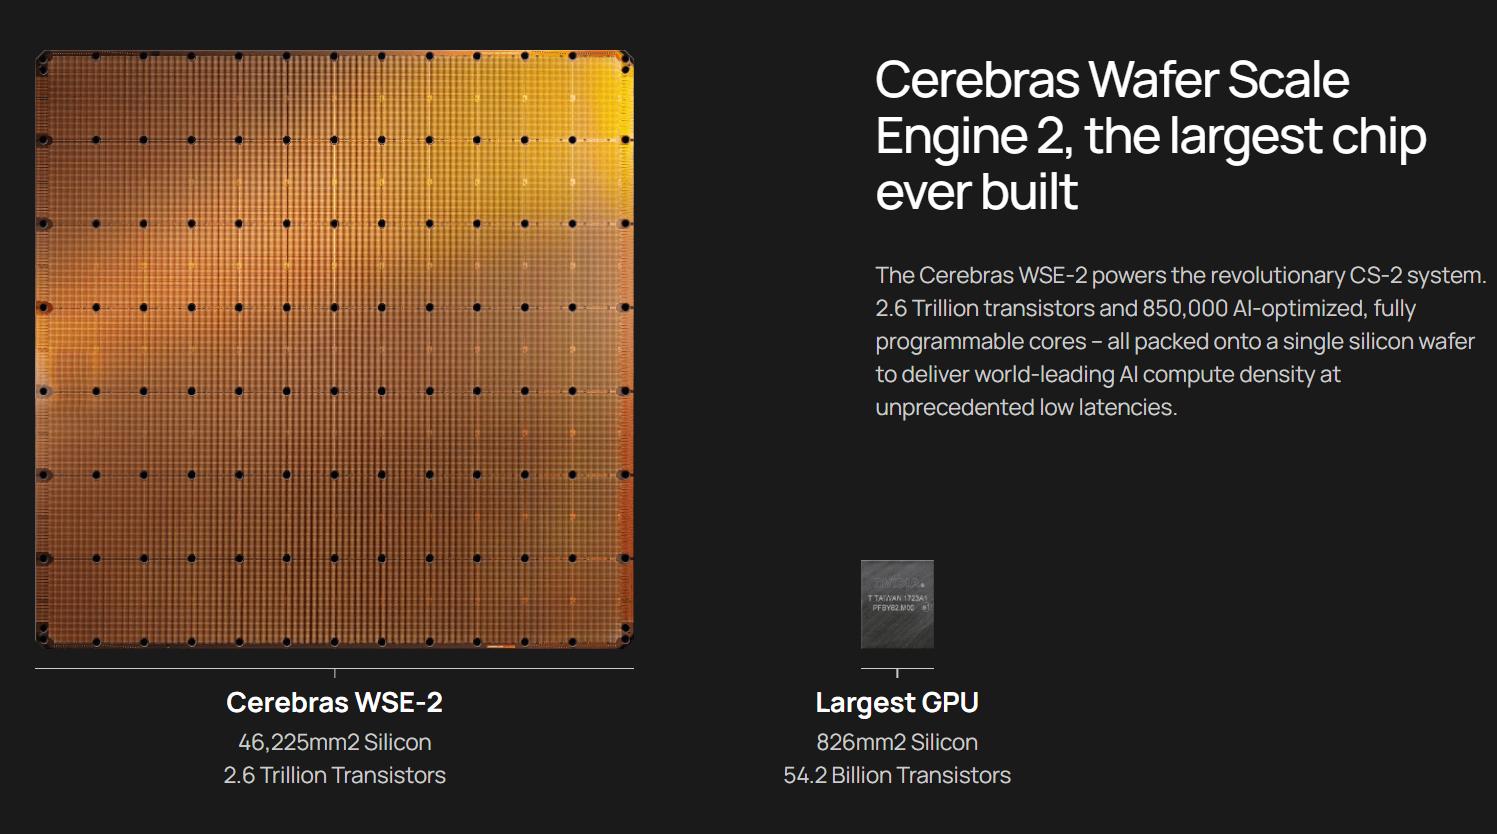 Cerebras Wafer Scale Engine Is A Massive AI Chip Featuring 2.6 Trillion  Transistors & Nearly 1 Million Cores